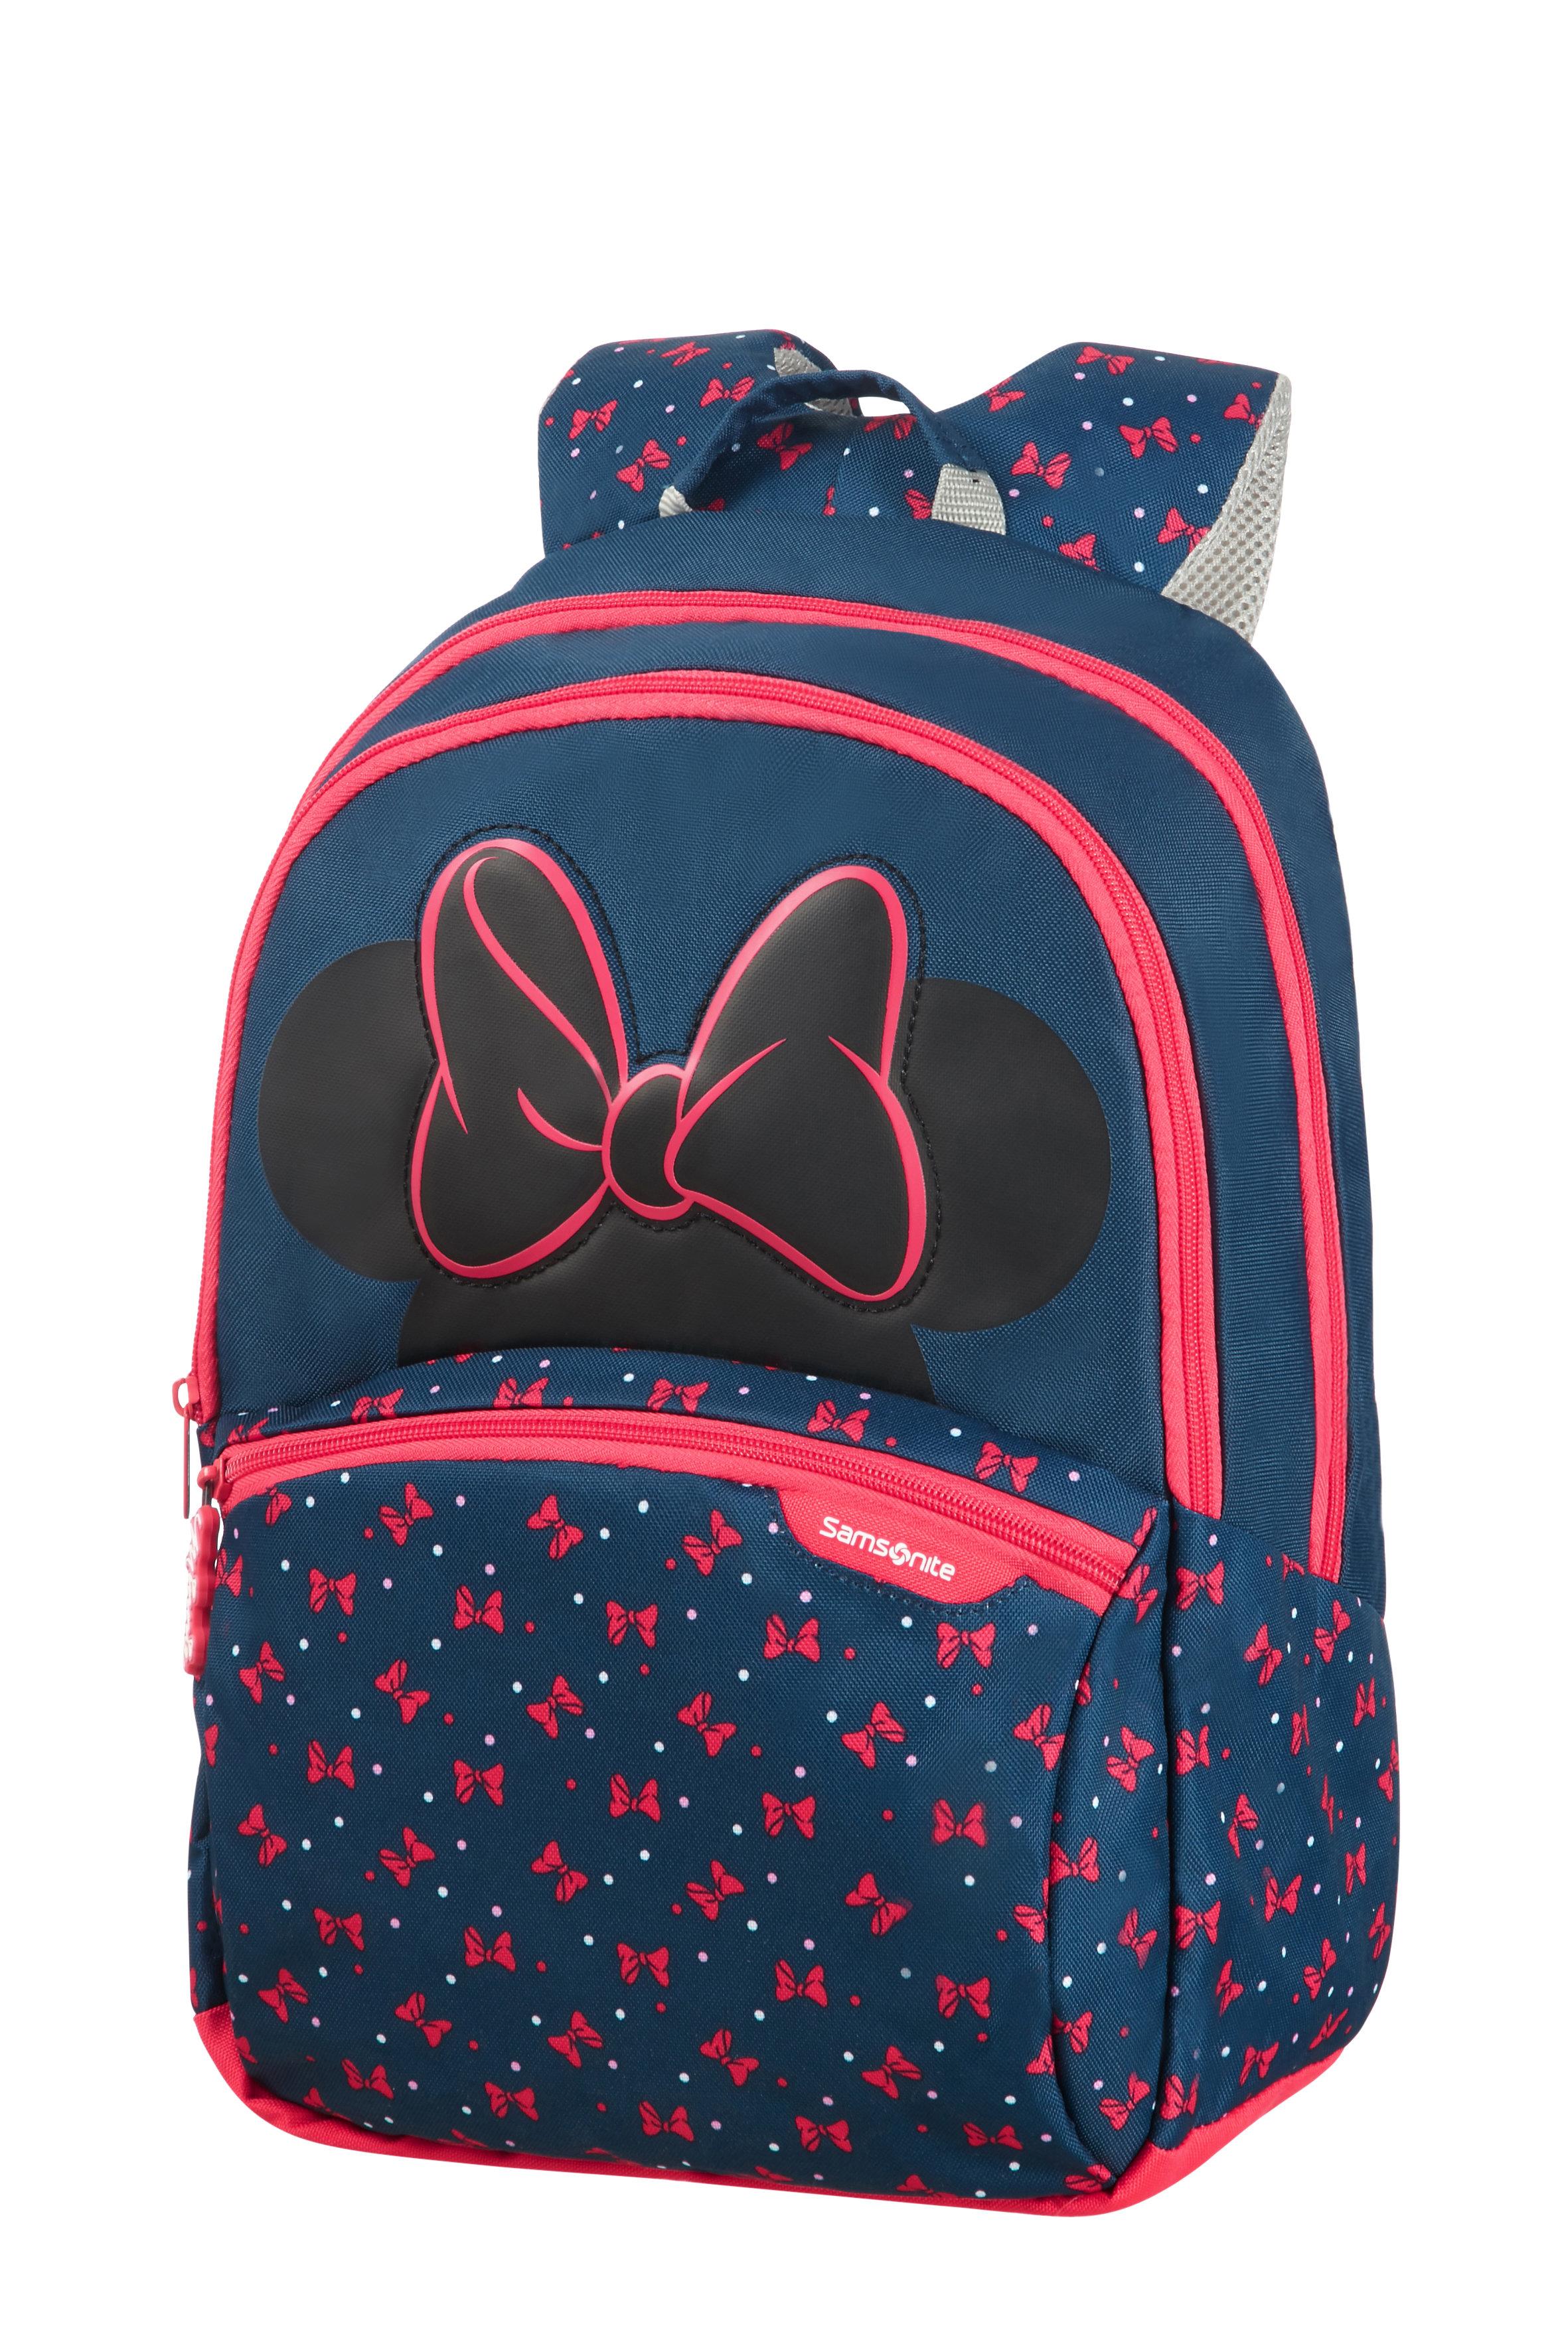 Рюкзак samsonite 23c 006 disney ultimate backpack m рюкзак ортопедическая спинка